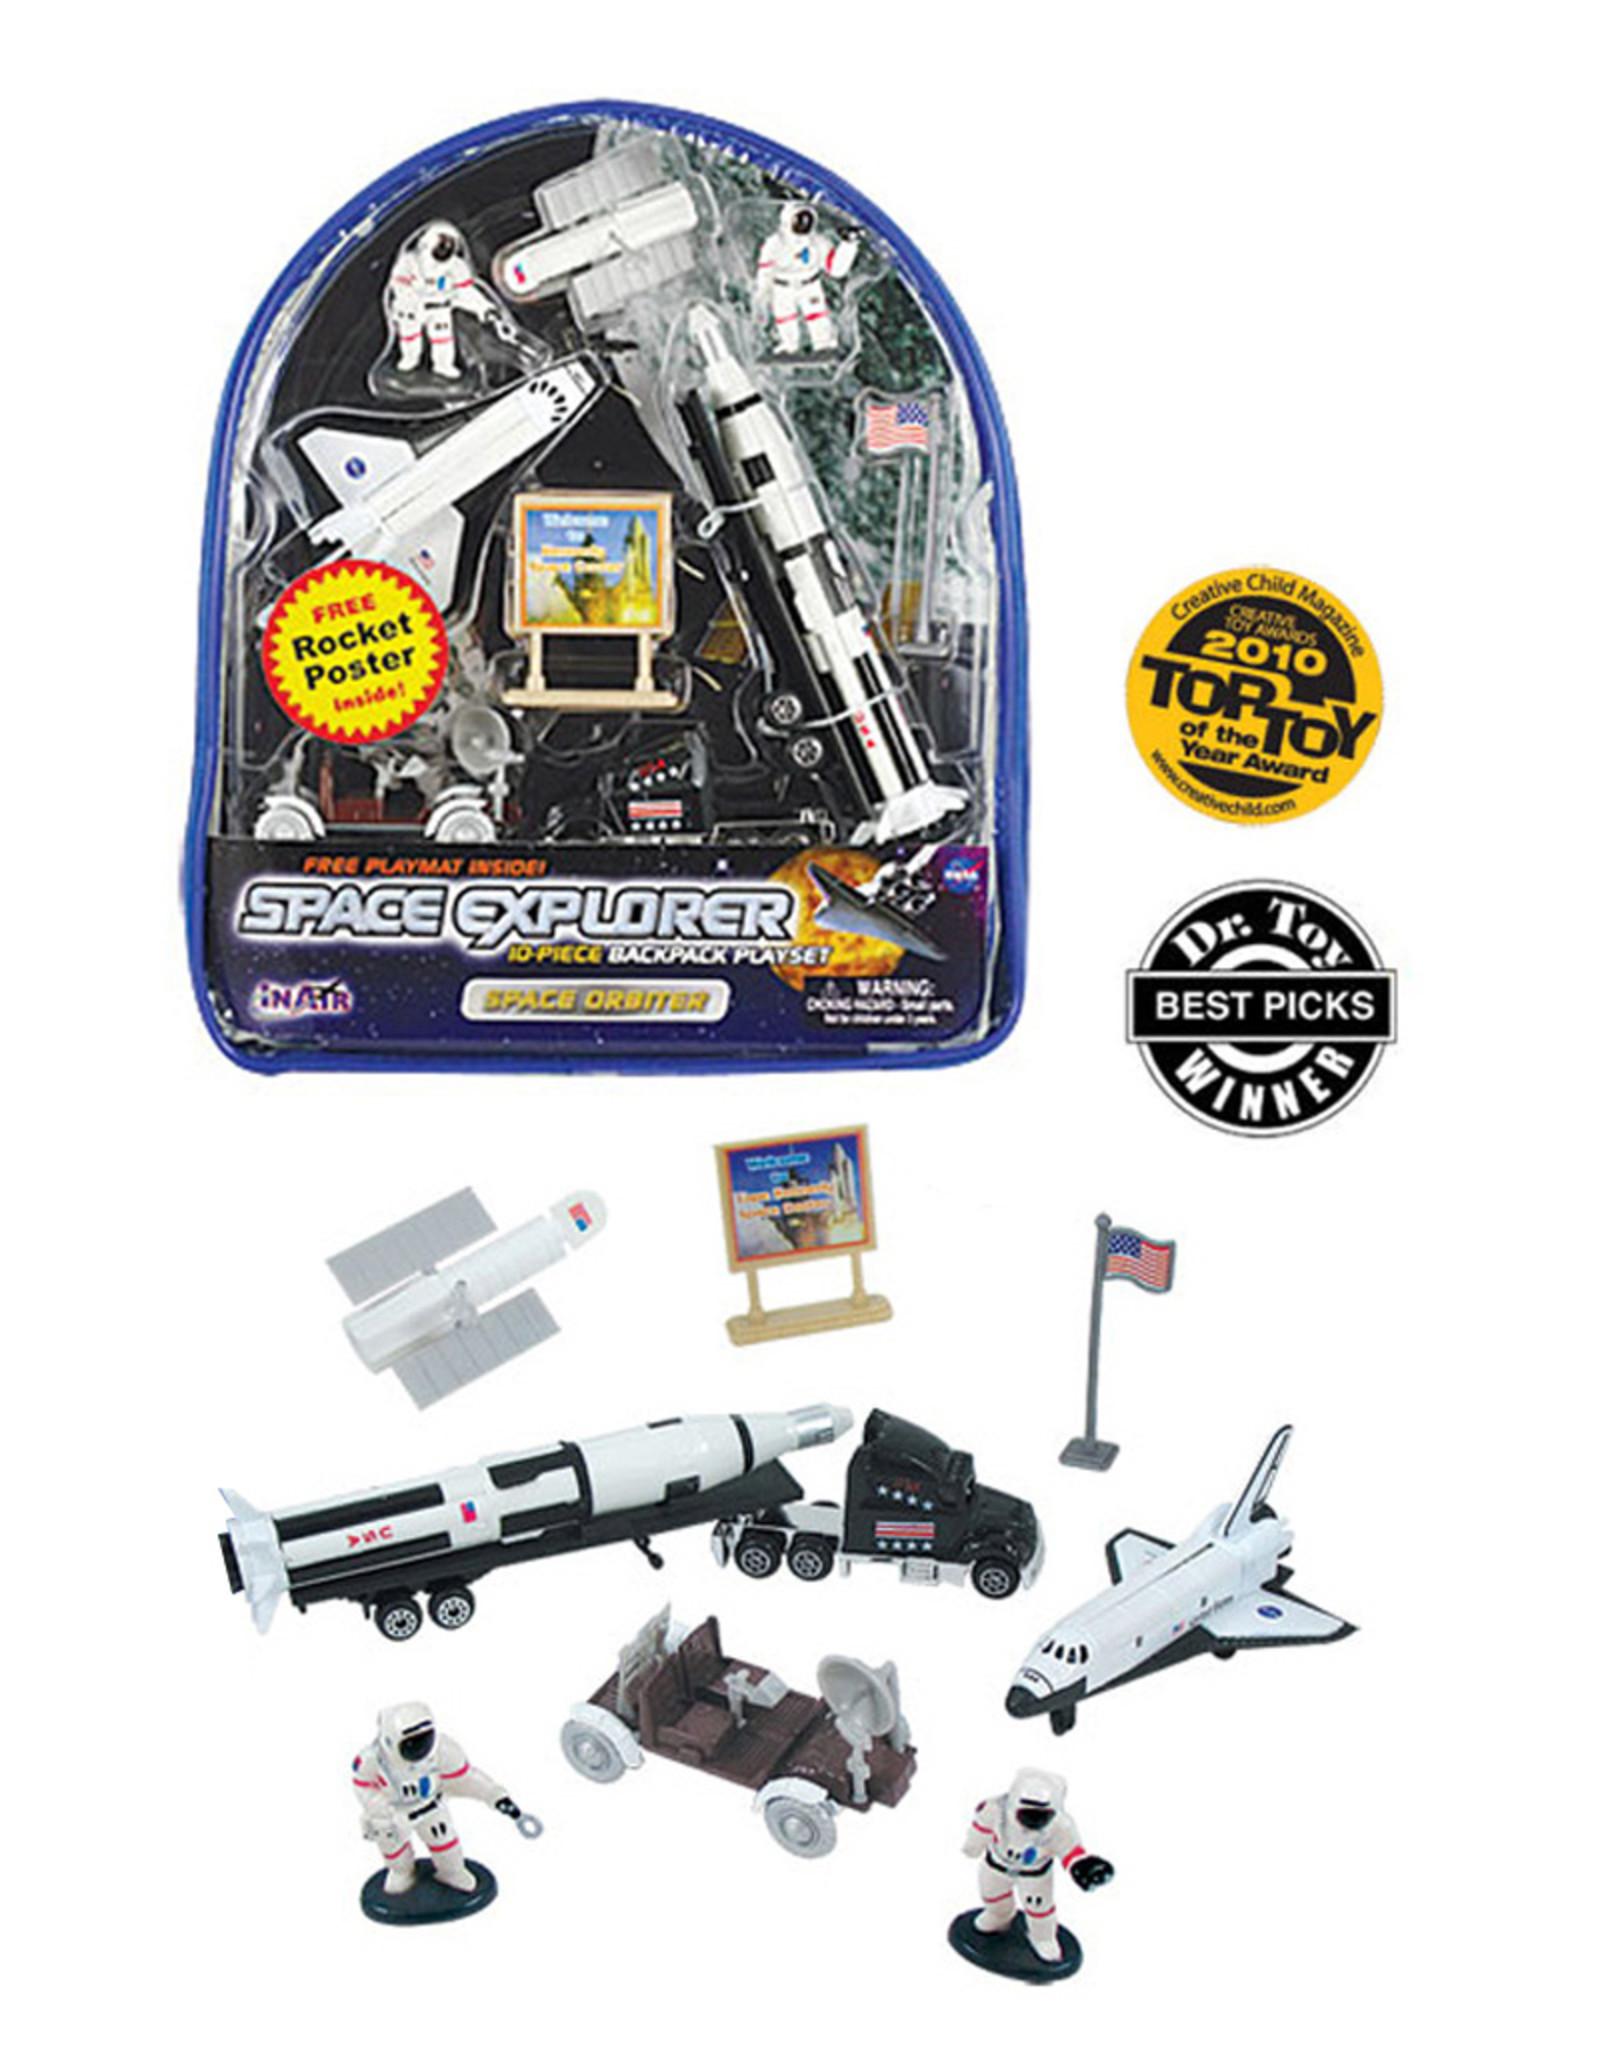 Space Explorer Backpack Set - Space Orbiter